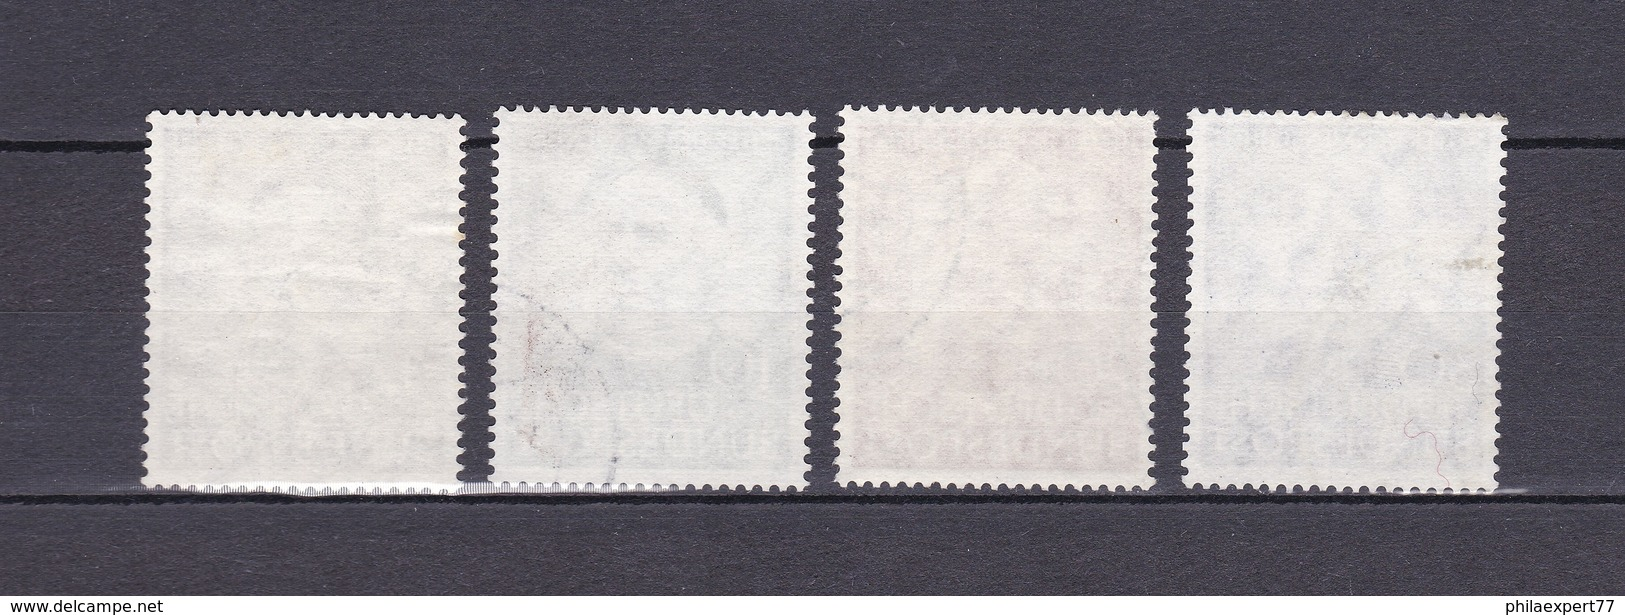 BRD - 1953 - Michel Nr. 173/176 - Gest. - 100 Euro - Gebraucht